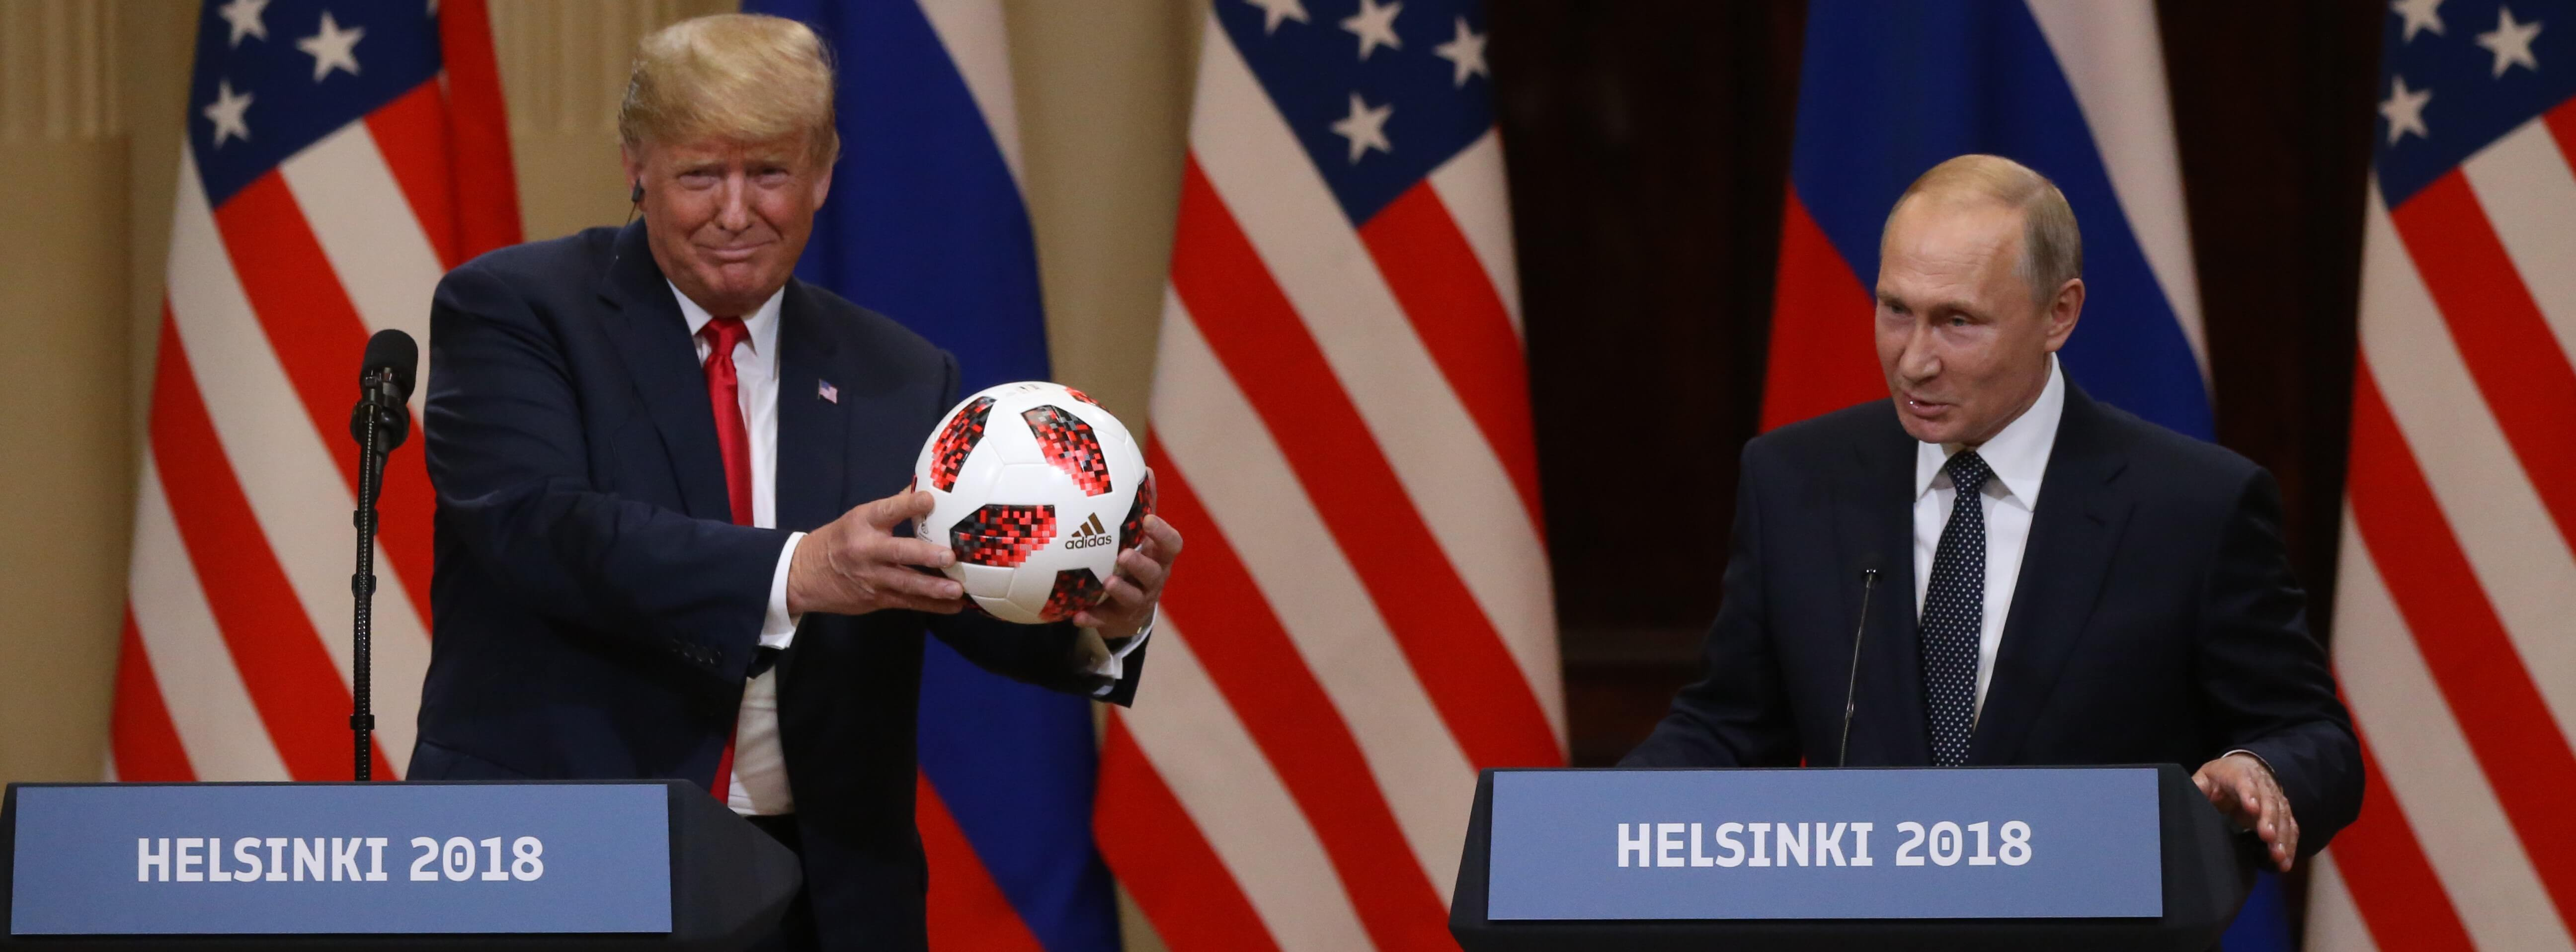 Russian President Vladimir Putin gives US President Donald Trump a football after their summit in Helsinki (Photo: Mikhail Svetlov/Getty)